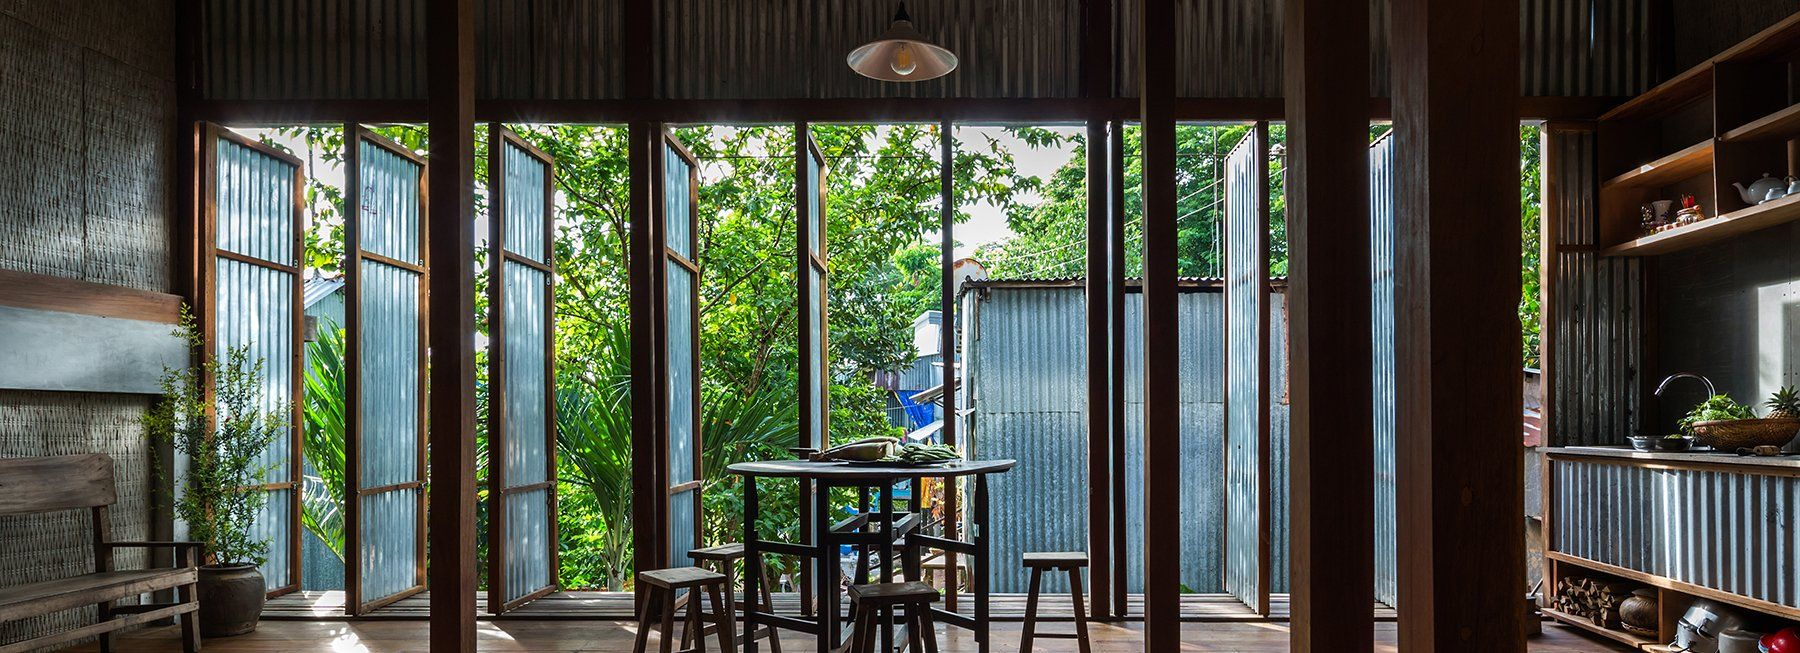 Nishizawaarchitects Builds House Using Corrugated Metal Panels Eco House Design Chau Doc Movable Walls